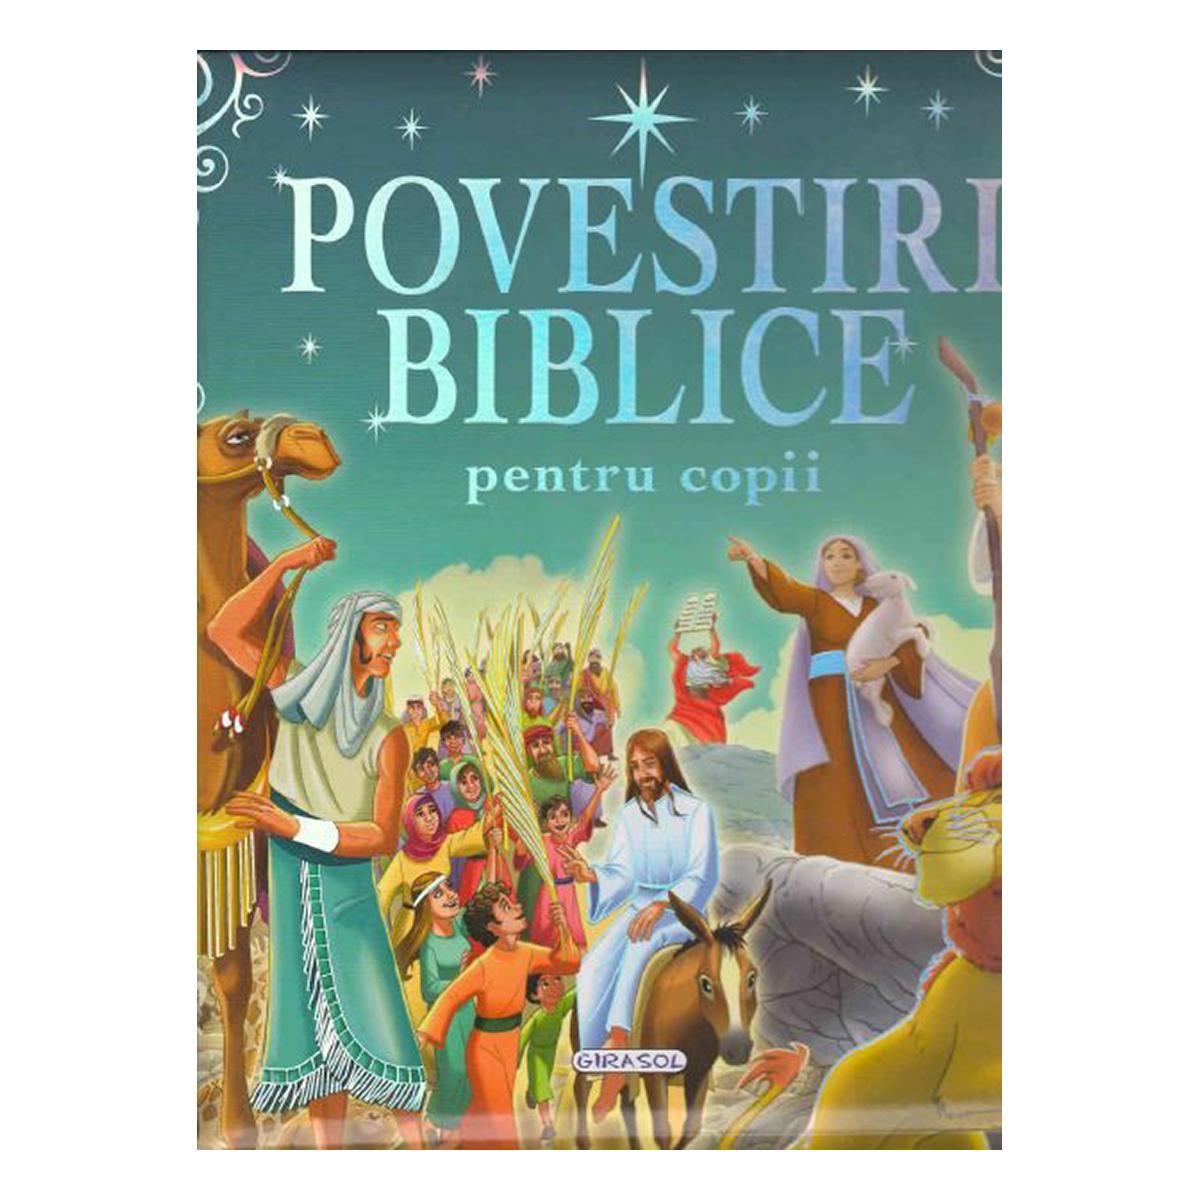 povestiri biblice pentru copii